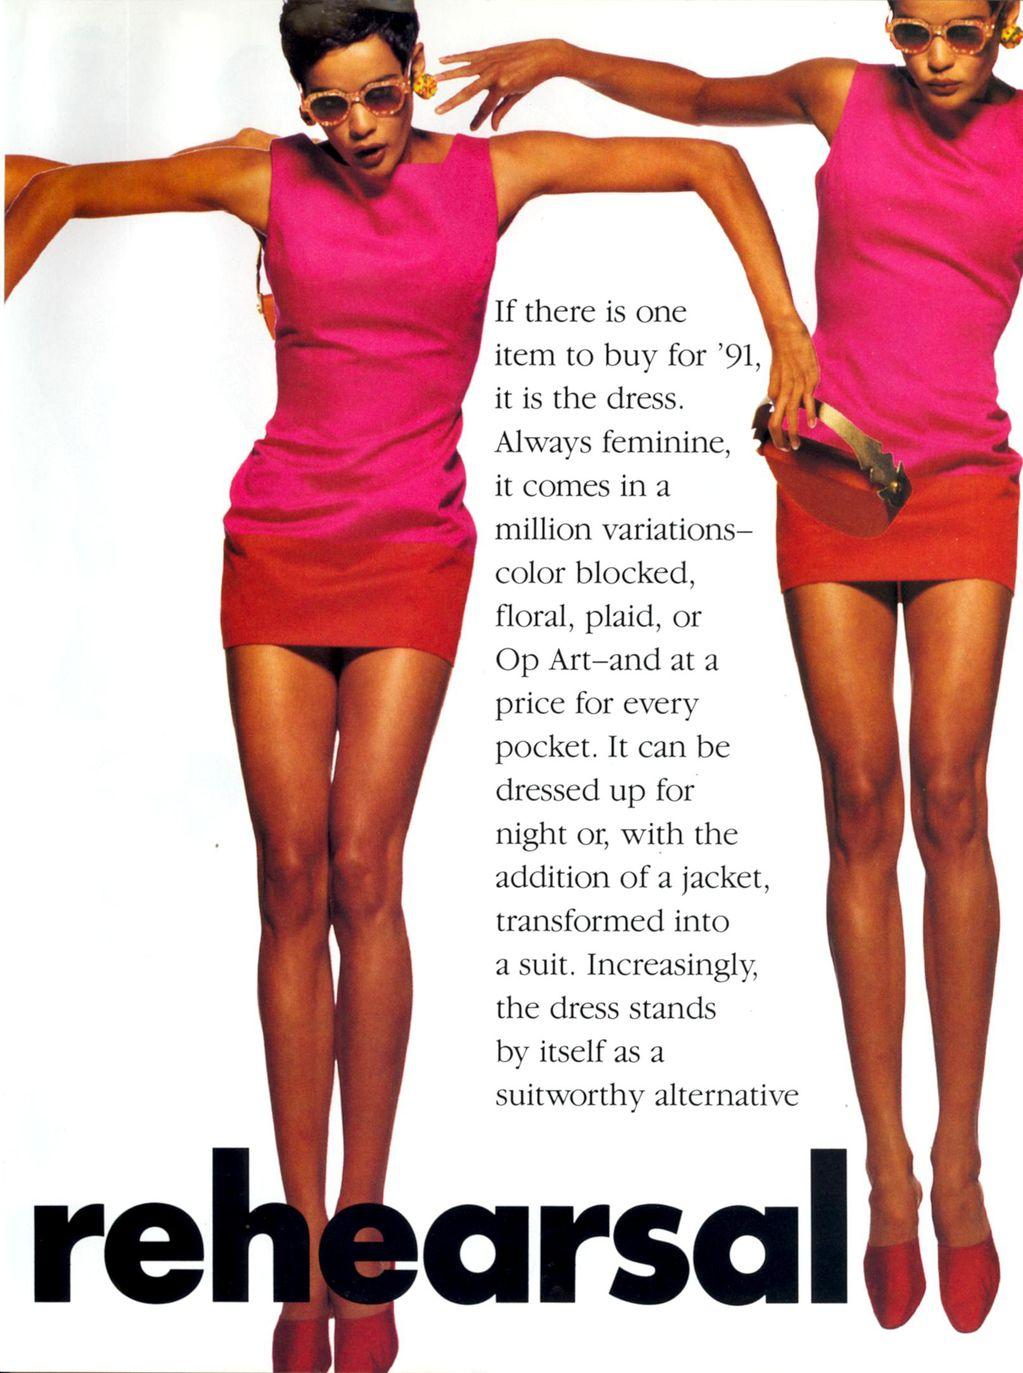 Vogue January 1991 | Great Buys - Dress Rehearsal 02.jpg